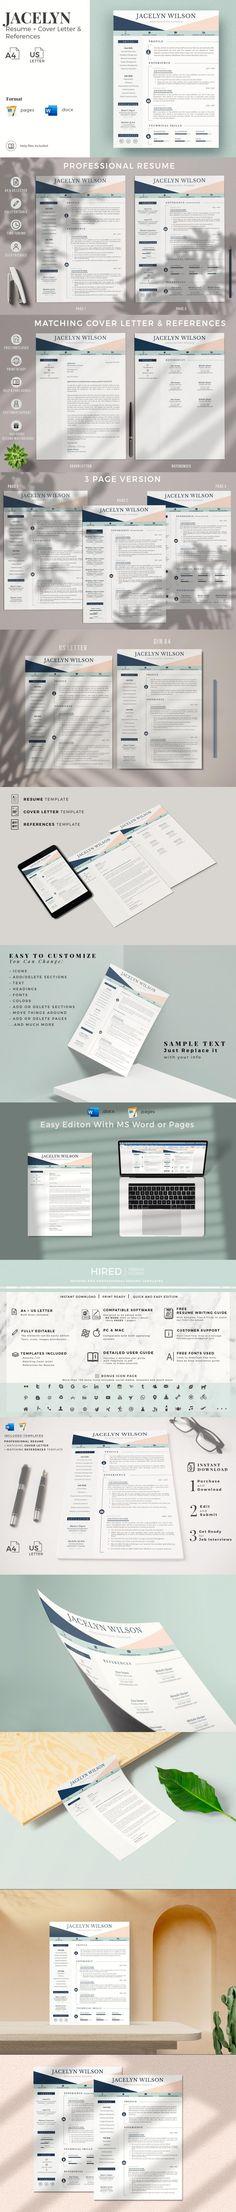 Creative Resume Example CV Cover Letter Template #ResumeTemplate #stationeries #pat #PaperDesign #resumeforteenagers #StationeryTemplate #minimalistresume #creativecvtemplate #basicresumelayout #hotelierresume #professionalresume #ResumeTemplateDesign #ResumeTips #modernresume #resumesample #a4resume #stylishresumetemplate #StationeryTemplates First Resume, My Resume, Resume Writing, Cv Design, Resume Design, Graphic Design, Stationery Printing, Stationery Design, Cover Letter Template